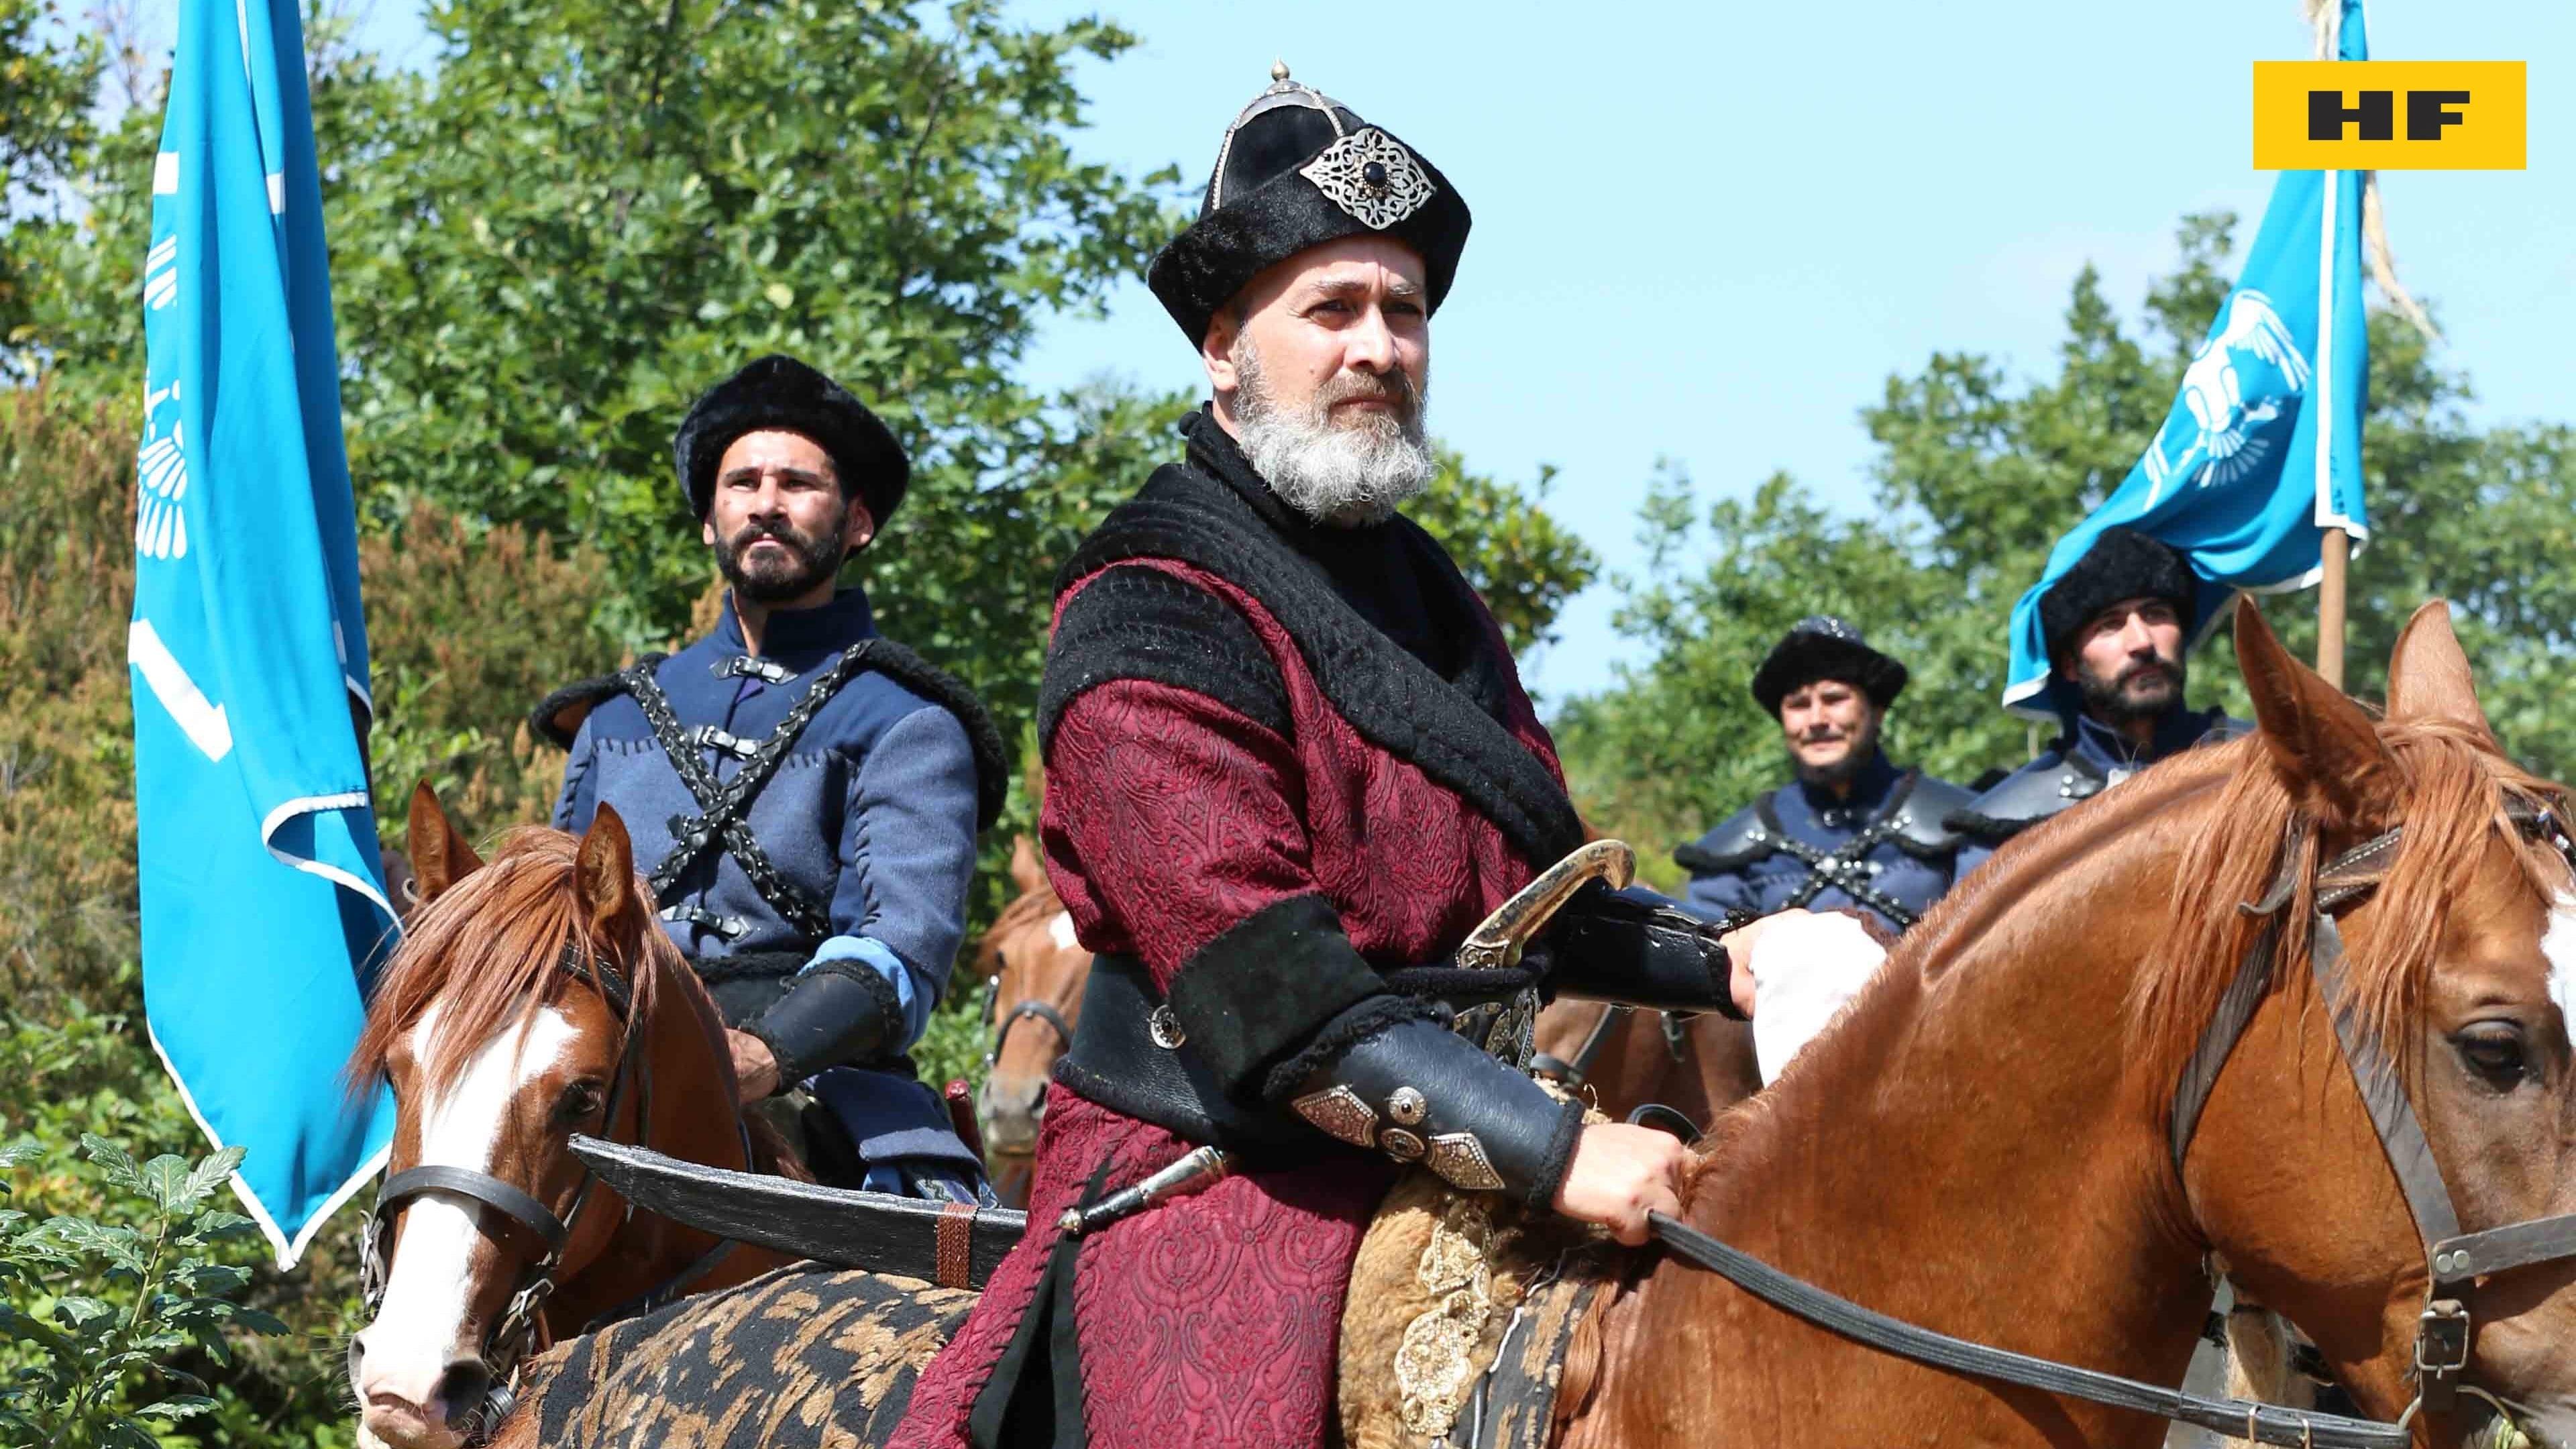 Watch Dirilis Ertugrul Season 2 Episode 33 - Historical Fun TV